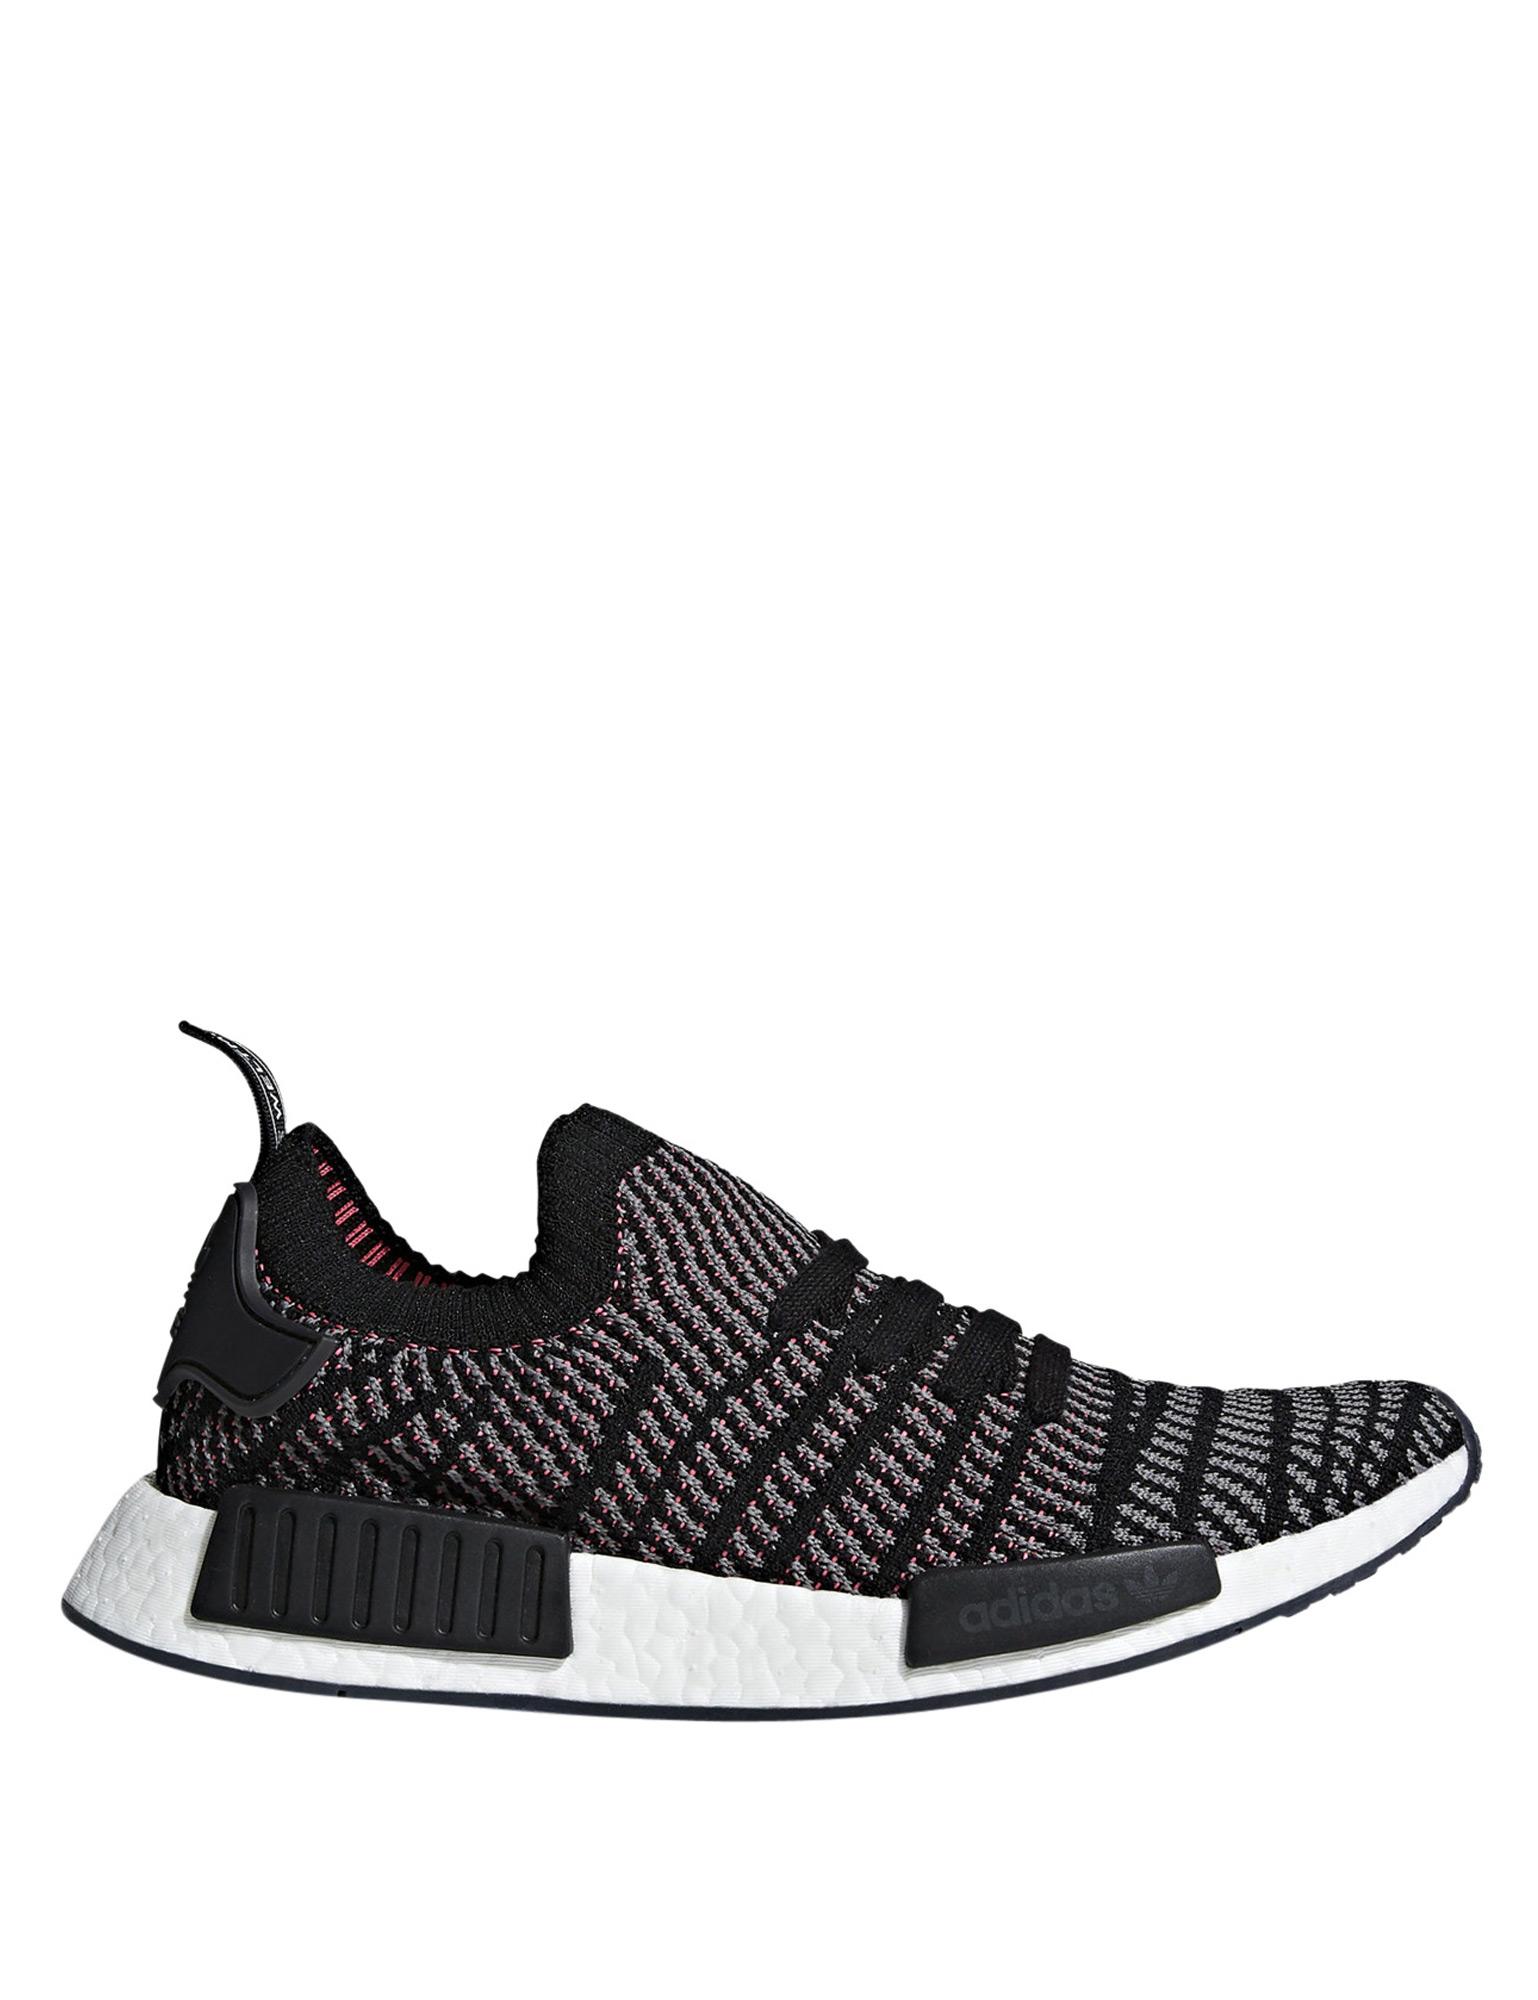 Köp Adidas Originals Men's Nmd_R1 Stlt Sneakers